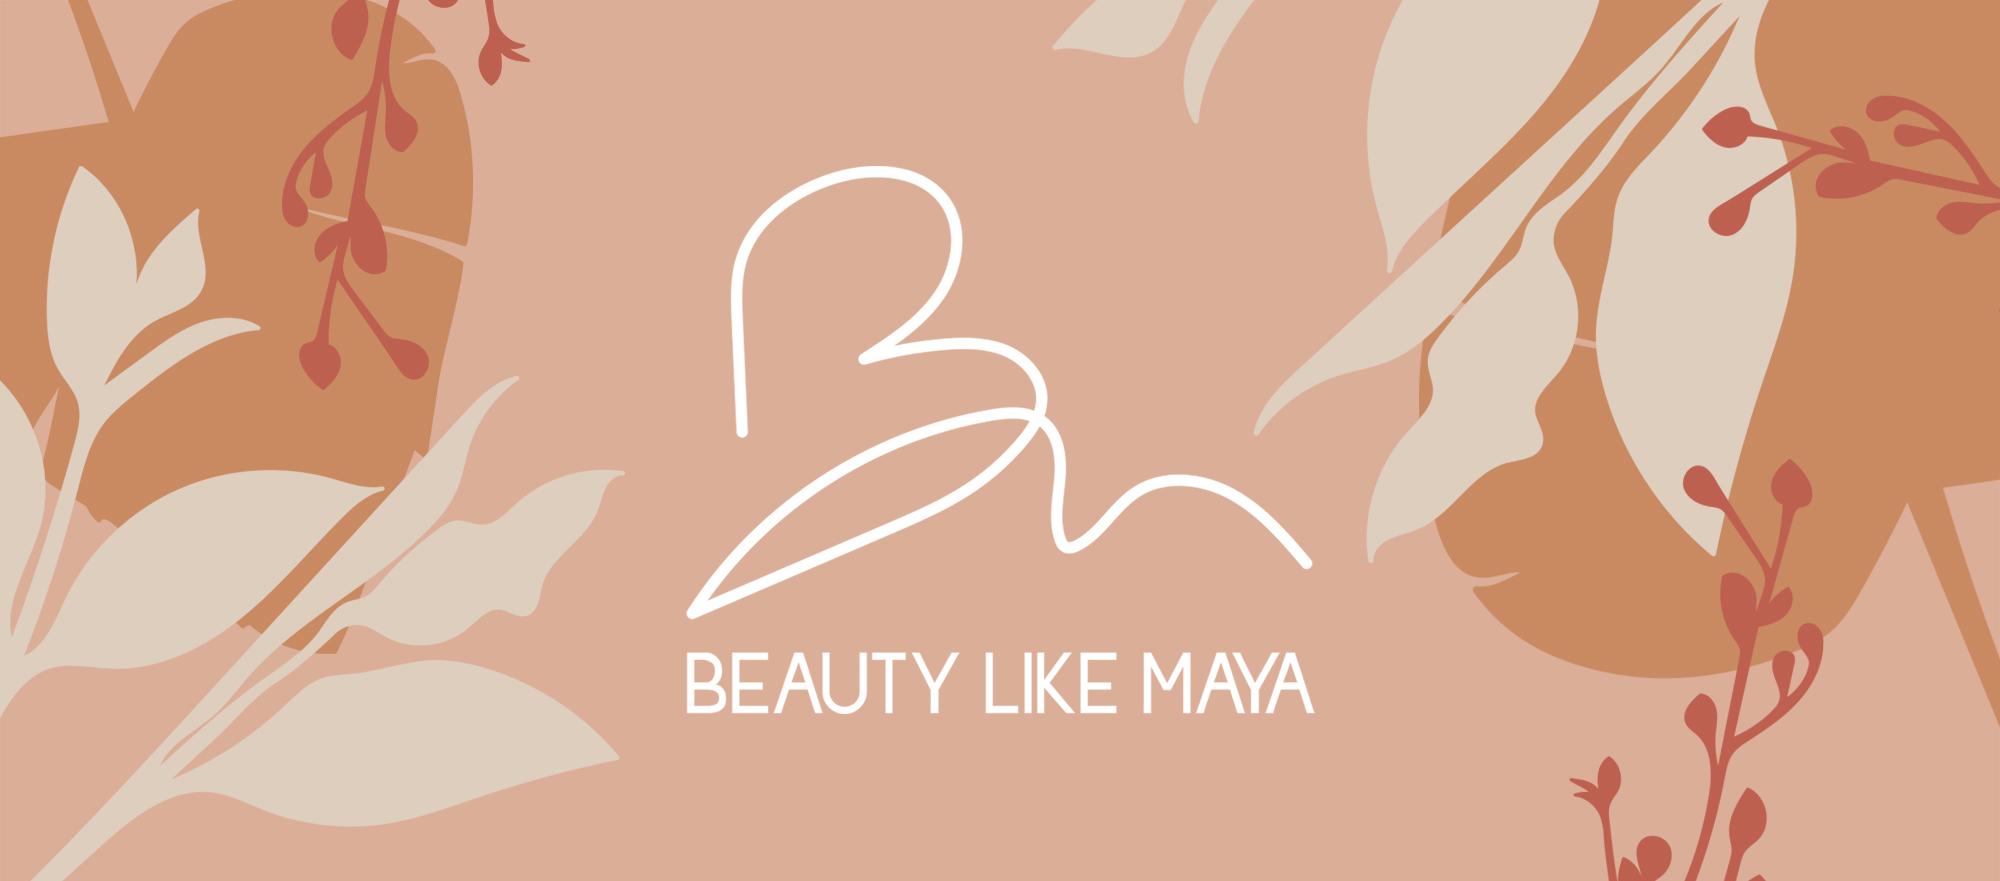 08 Journal Commission Beauty like Maya (01.10.2021) - studio katipeifer